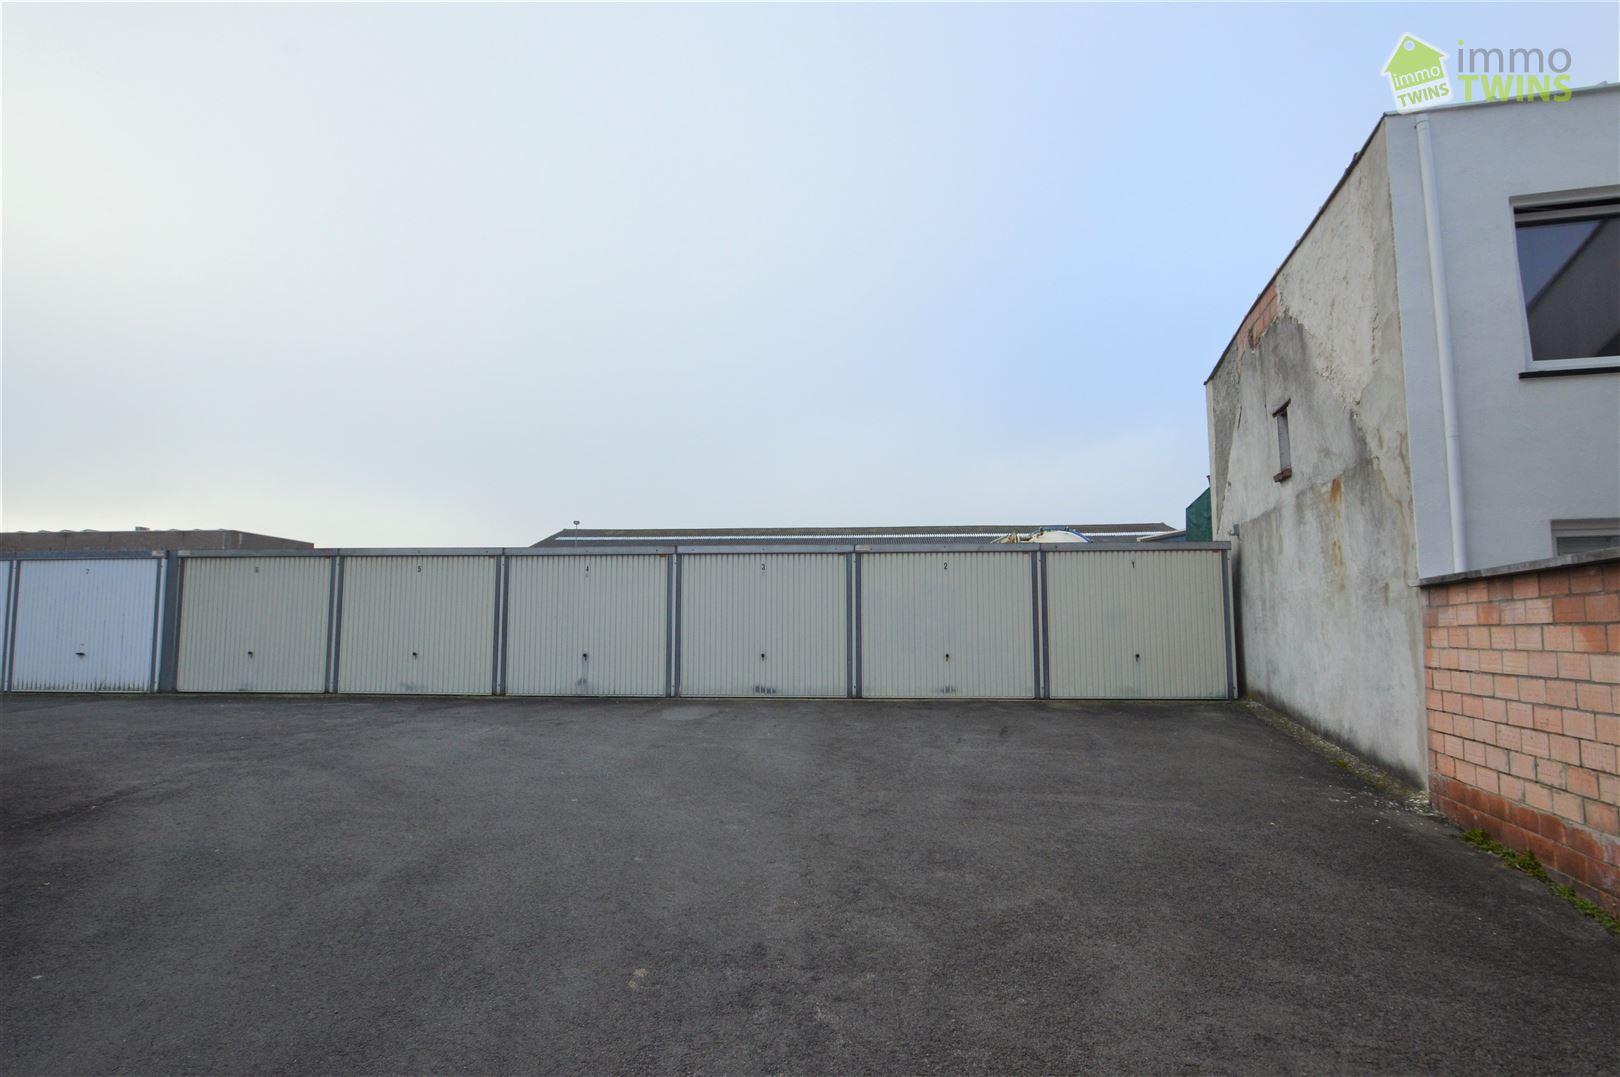 Foto 14 : Appartement te 9200 BAASRODE (België) - Prijs € 630